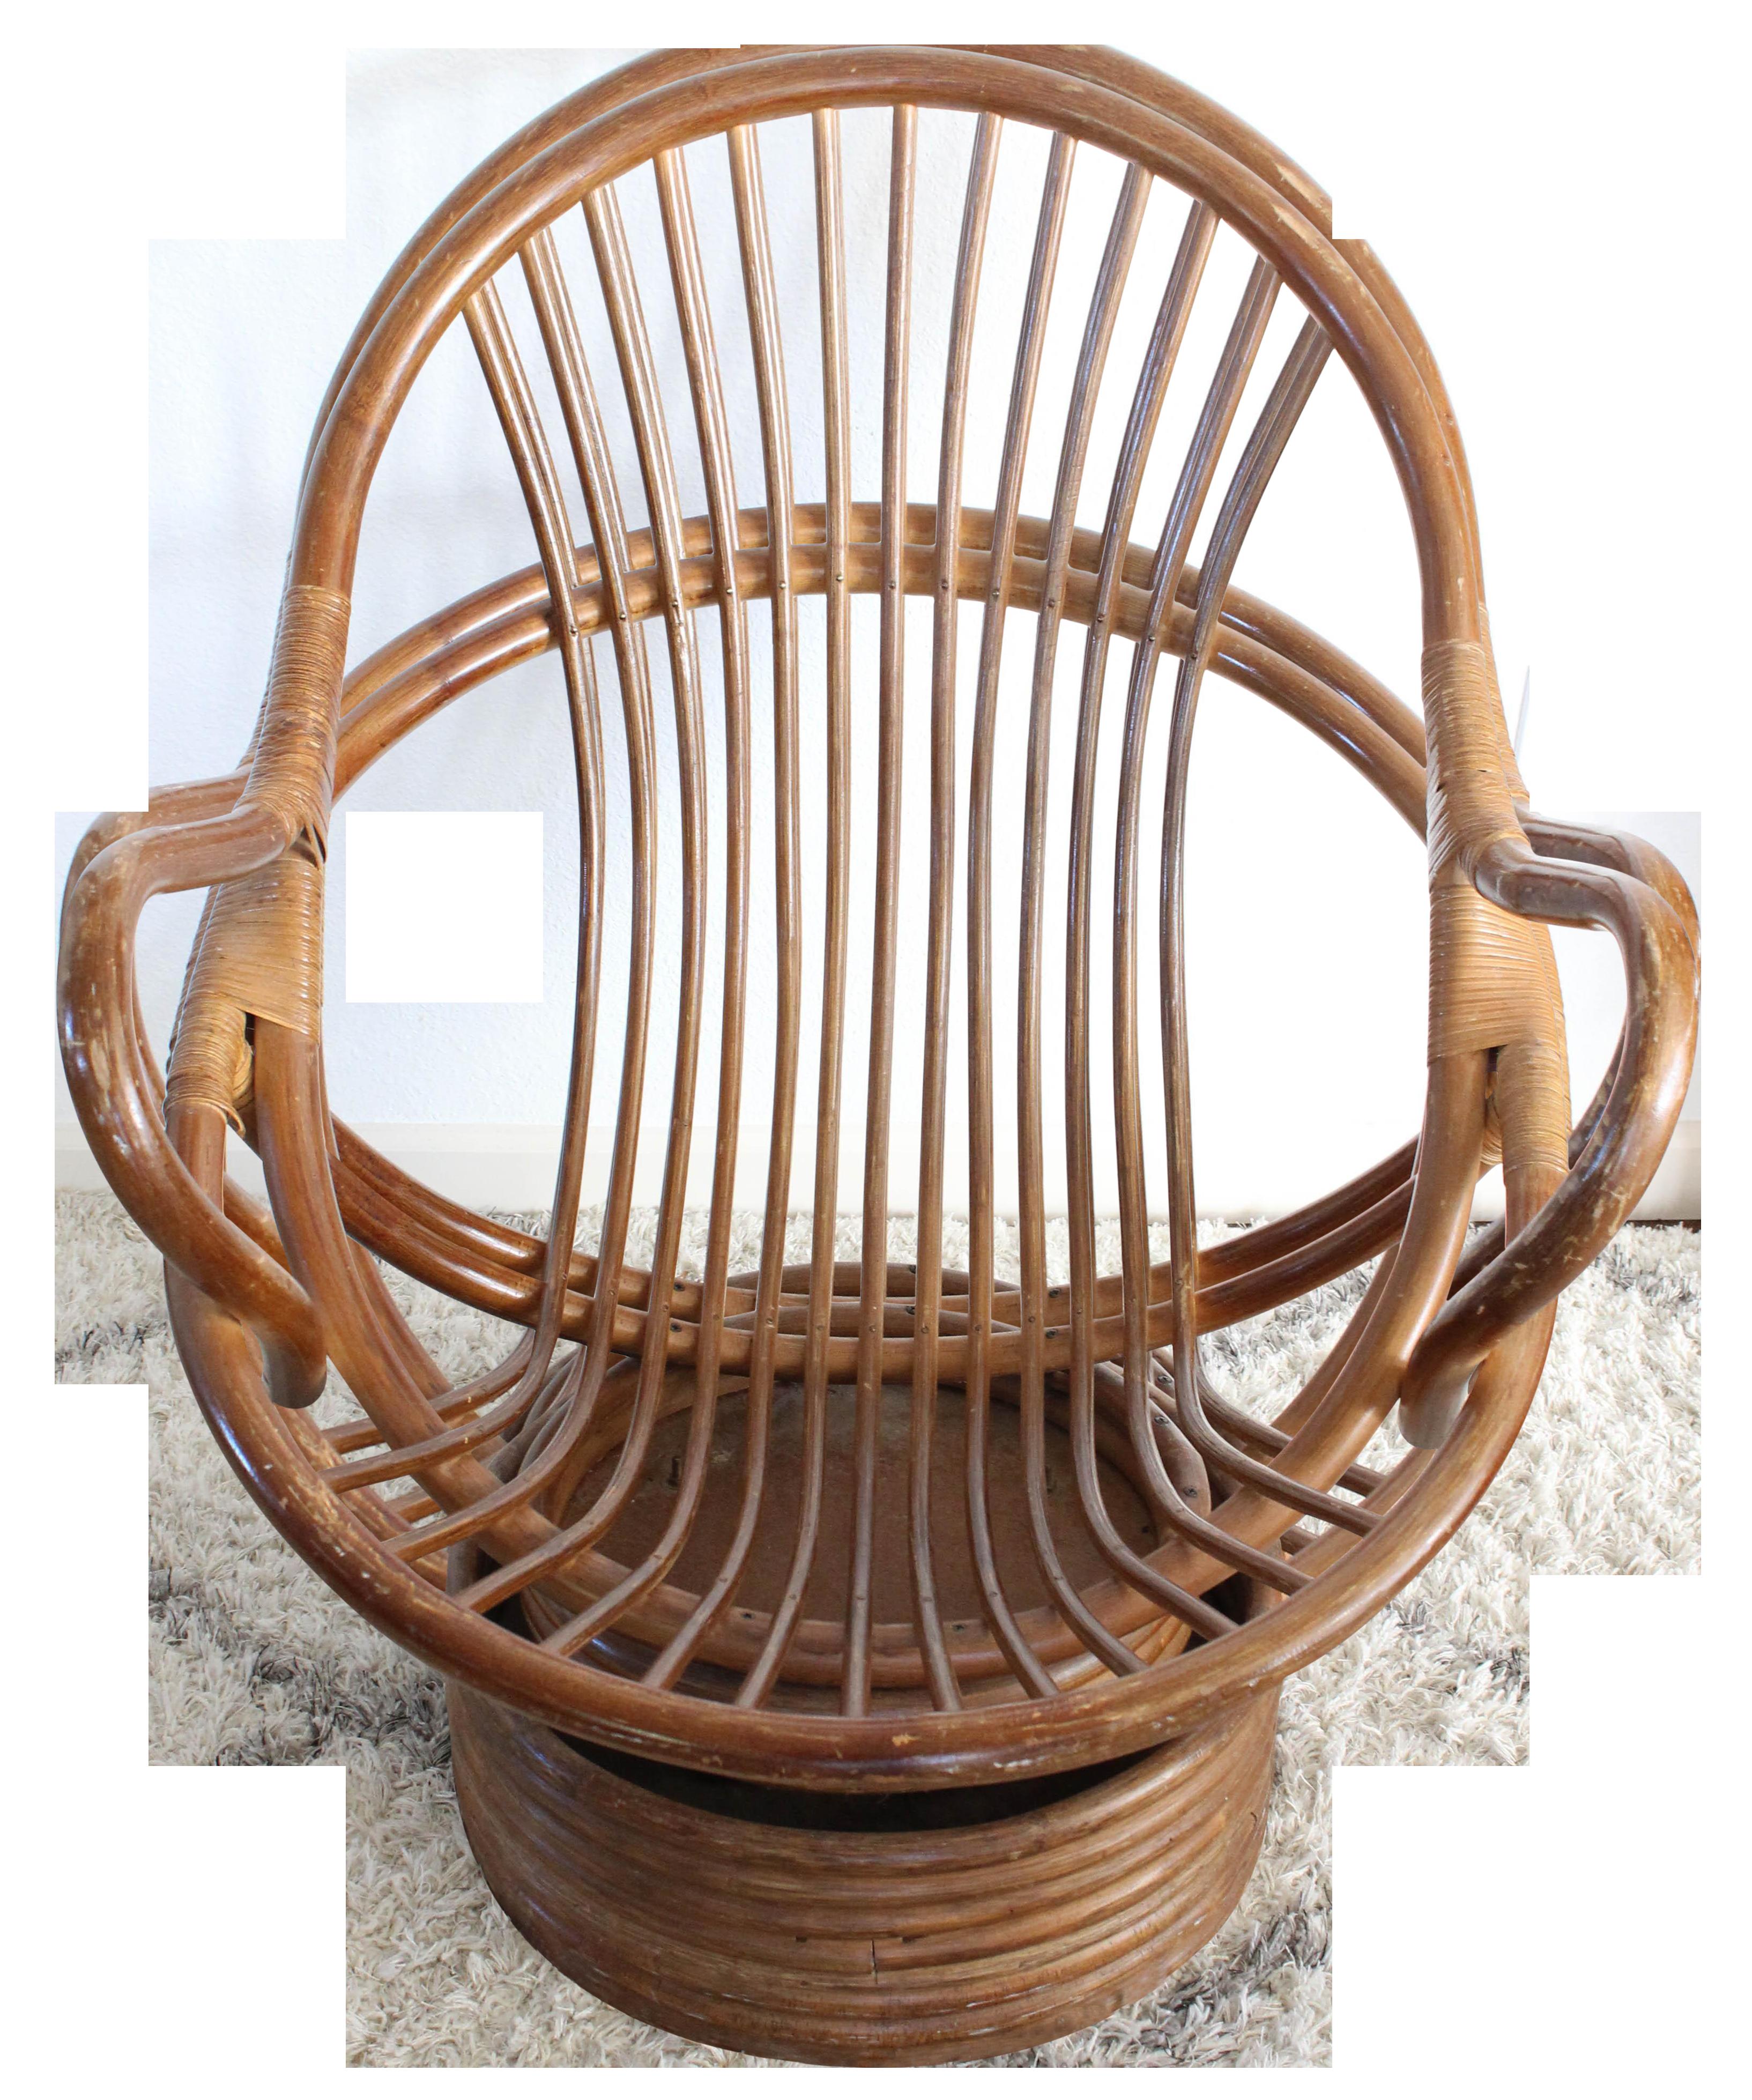 Vintage Rattan Swivel Chair Chair Swivel Chair Outdoor Dining Chair Cushions